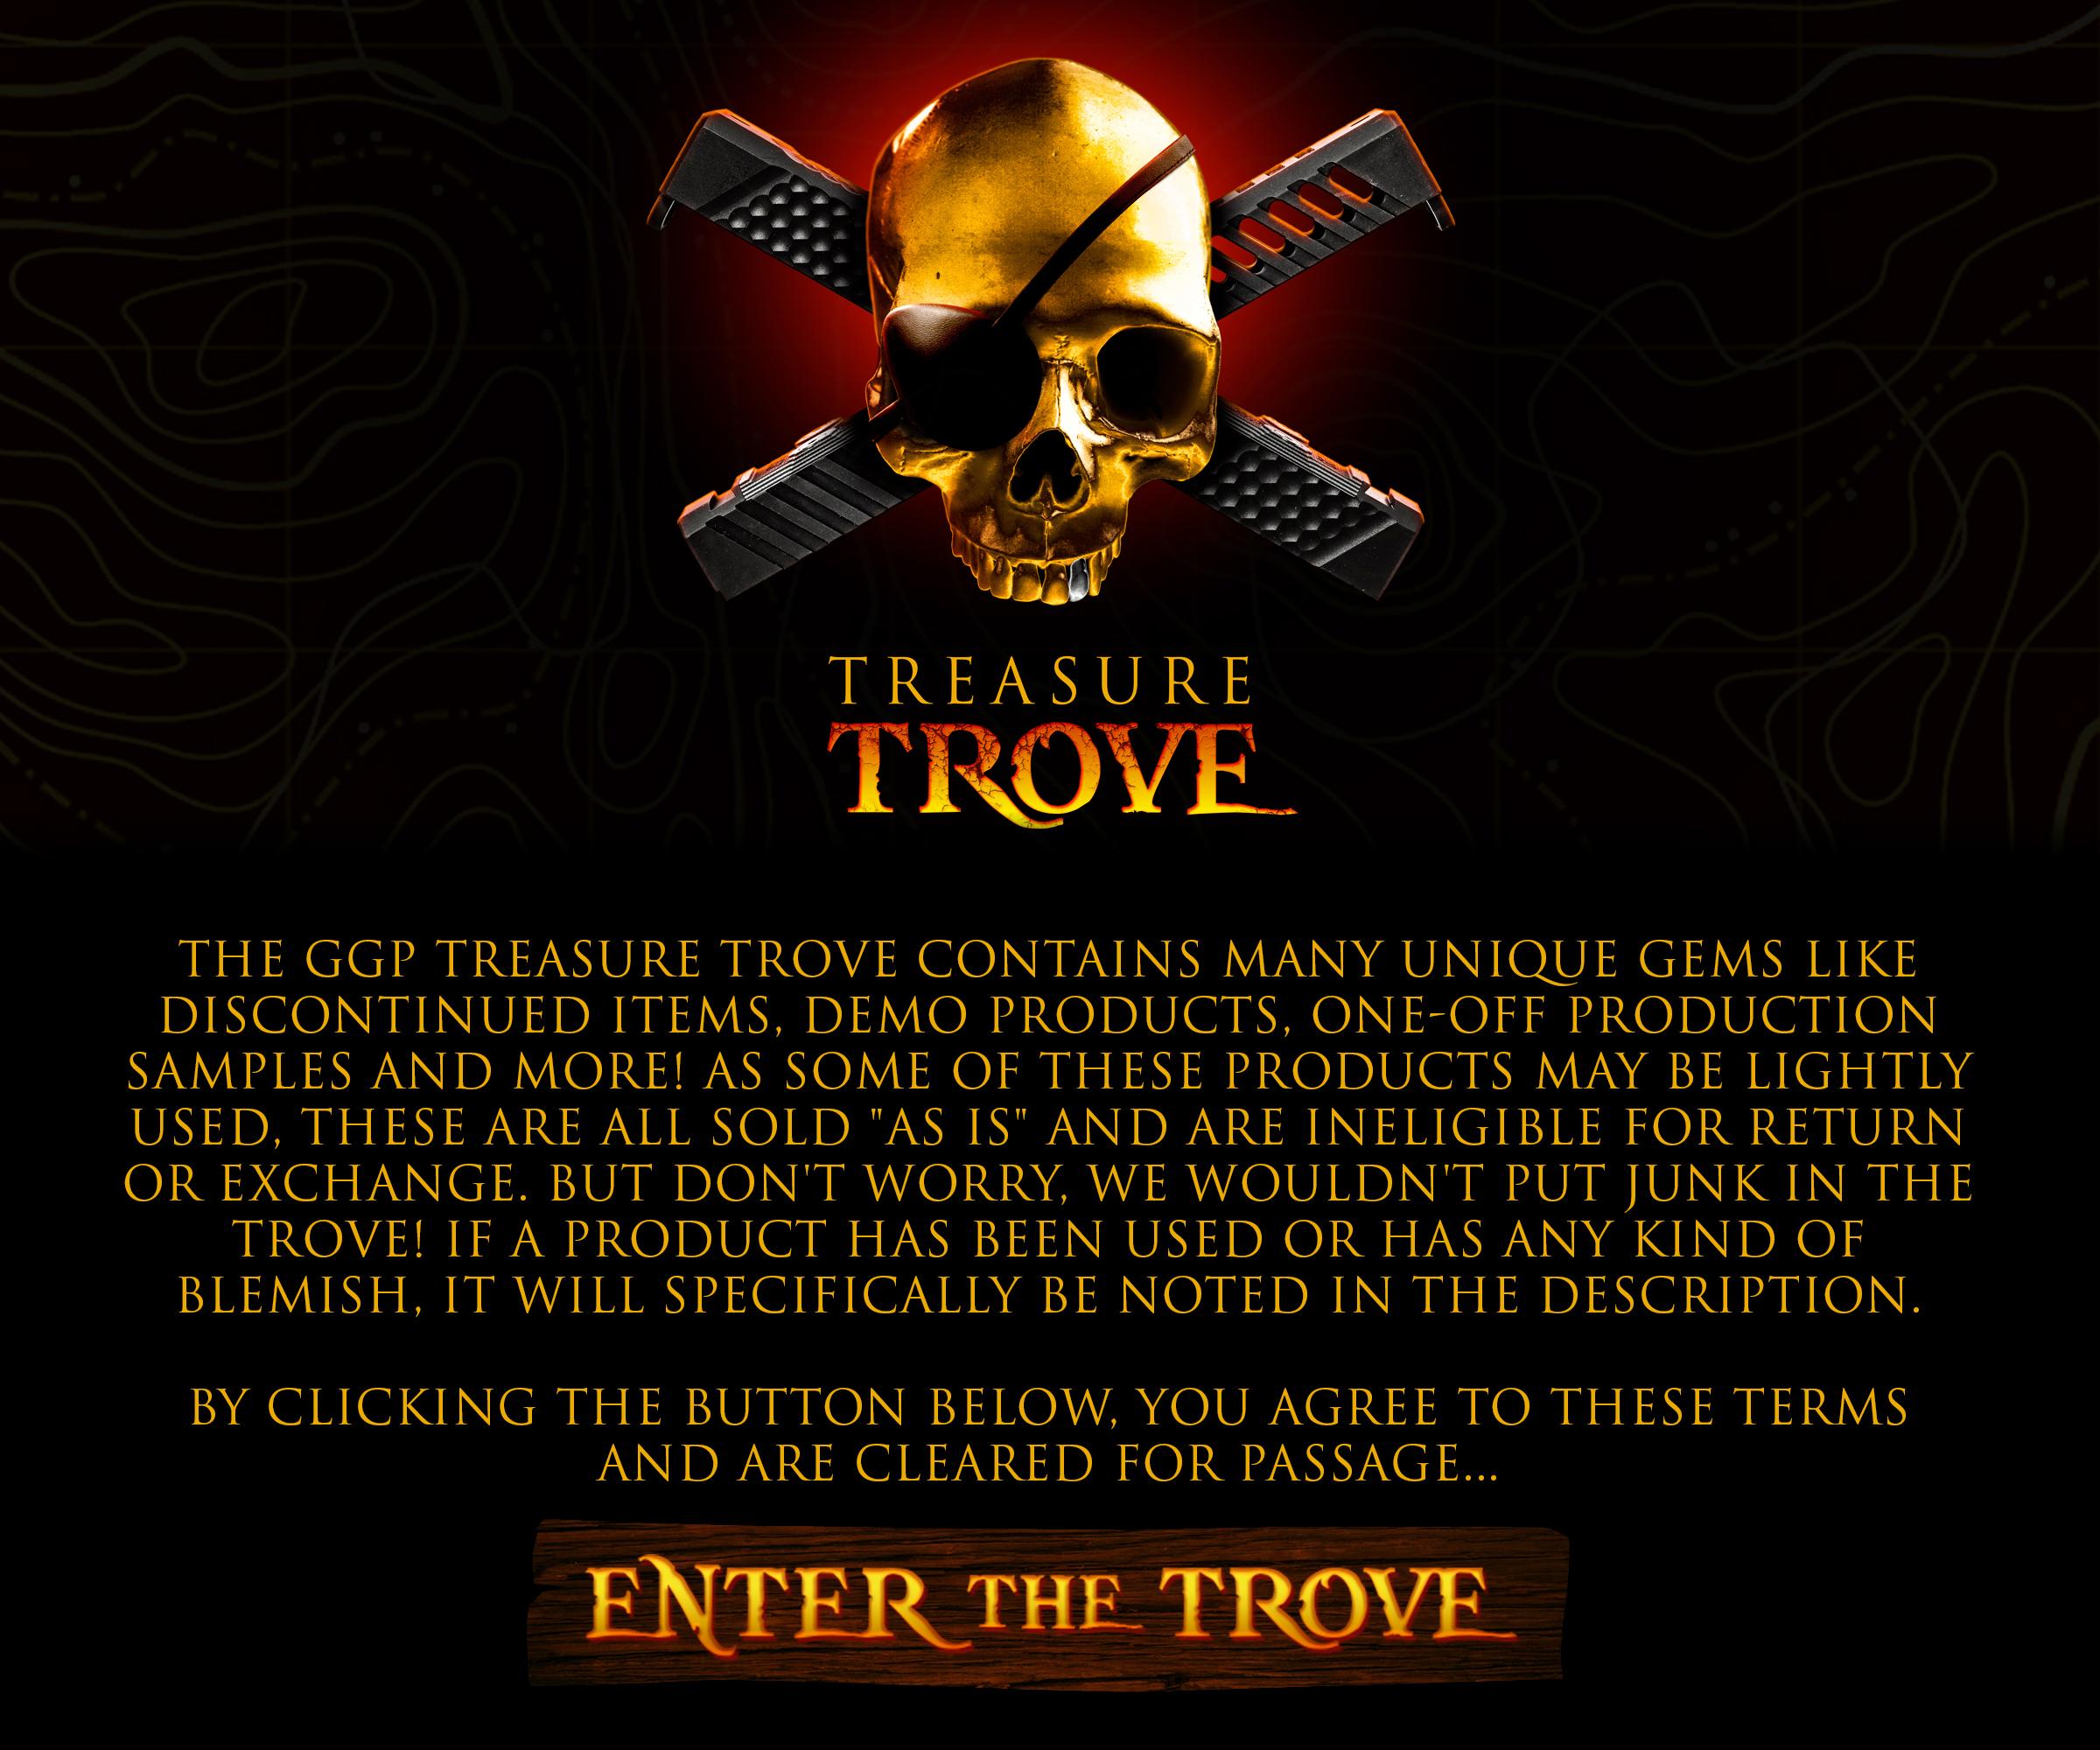 treasuretrove-combined.jpg